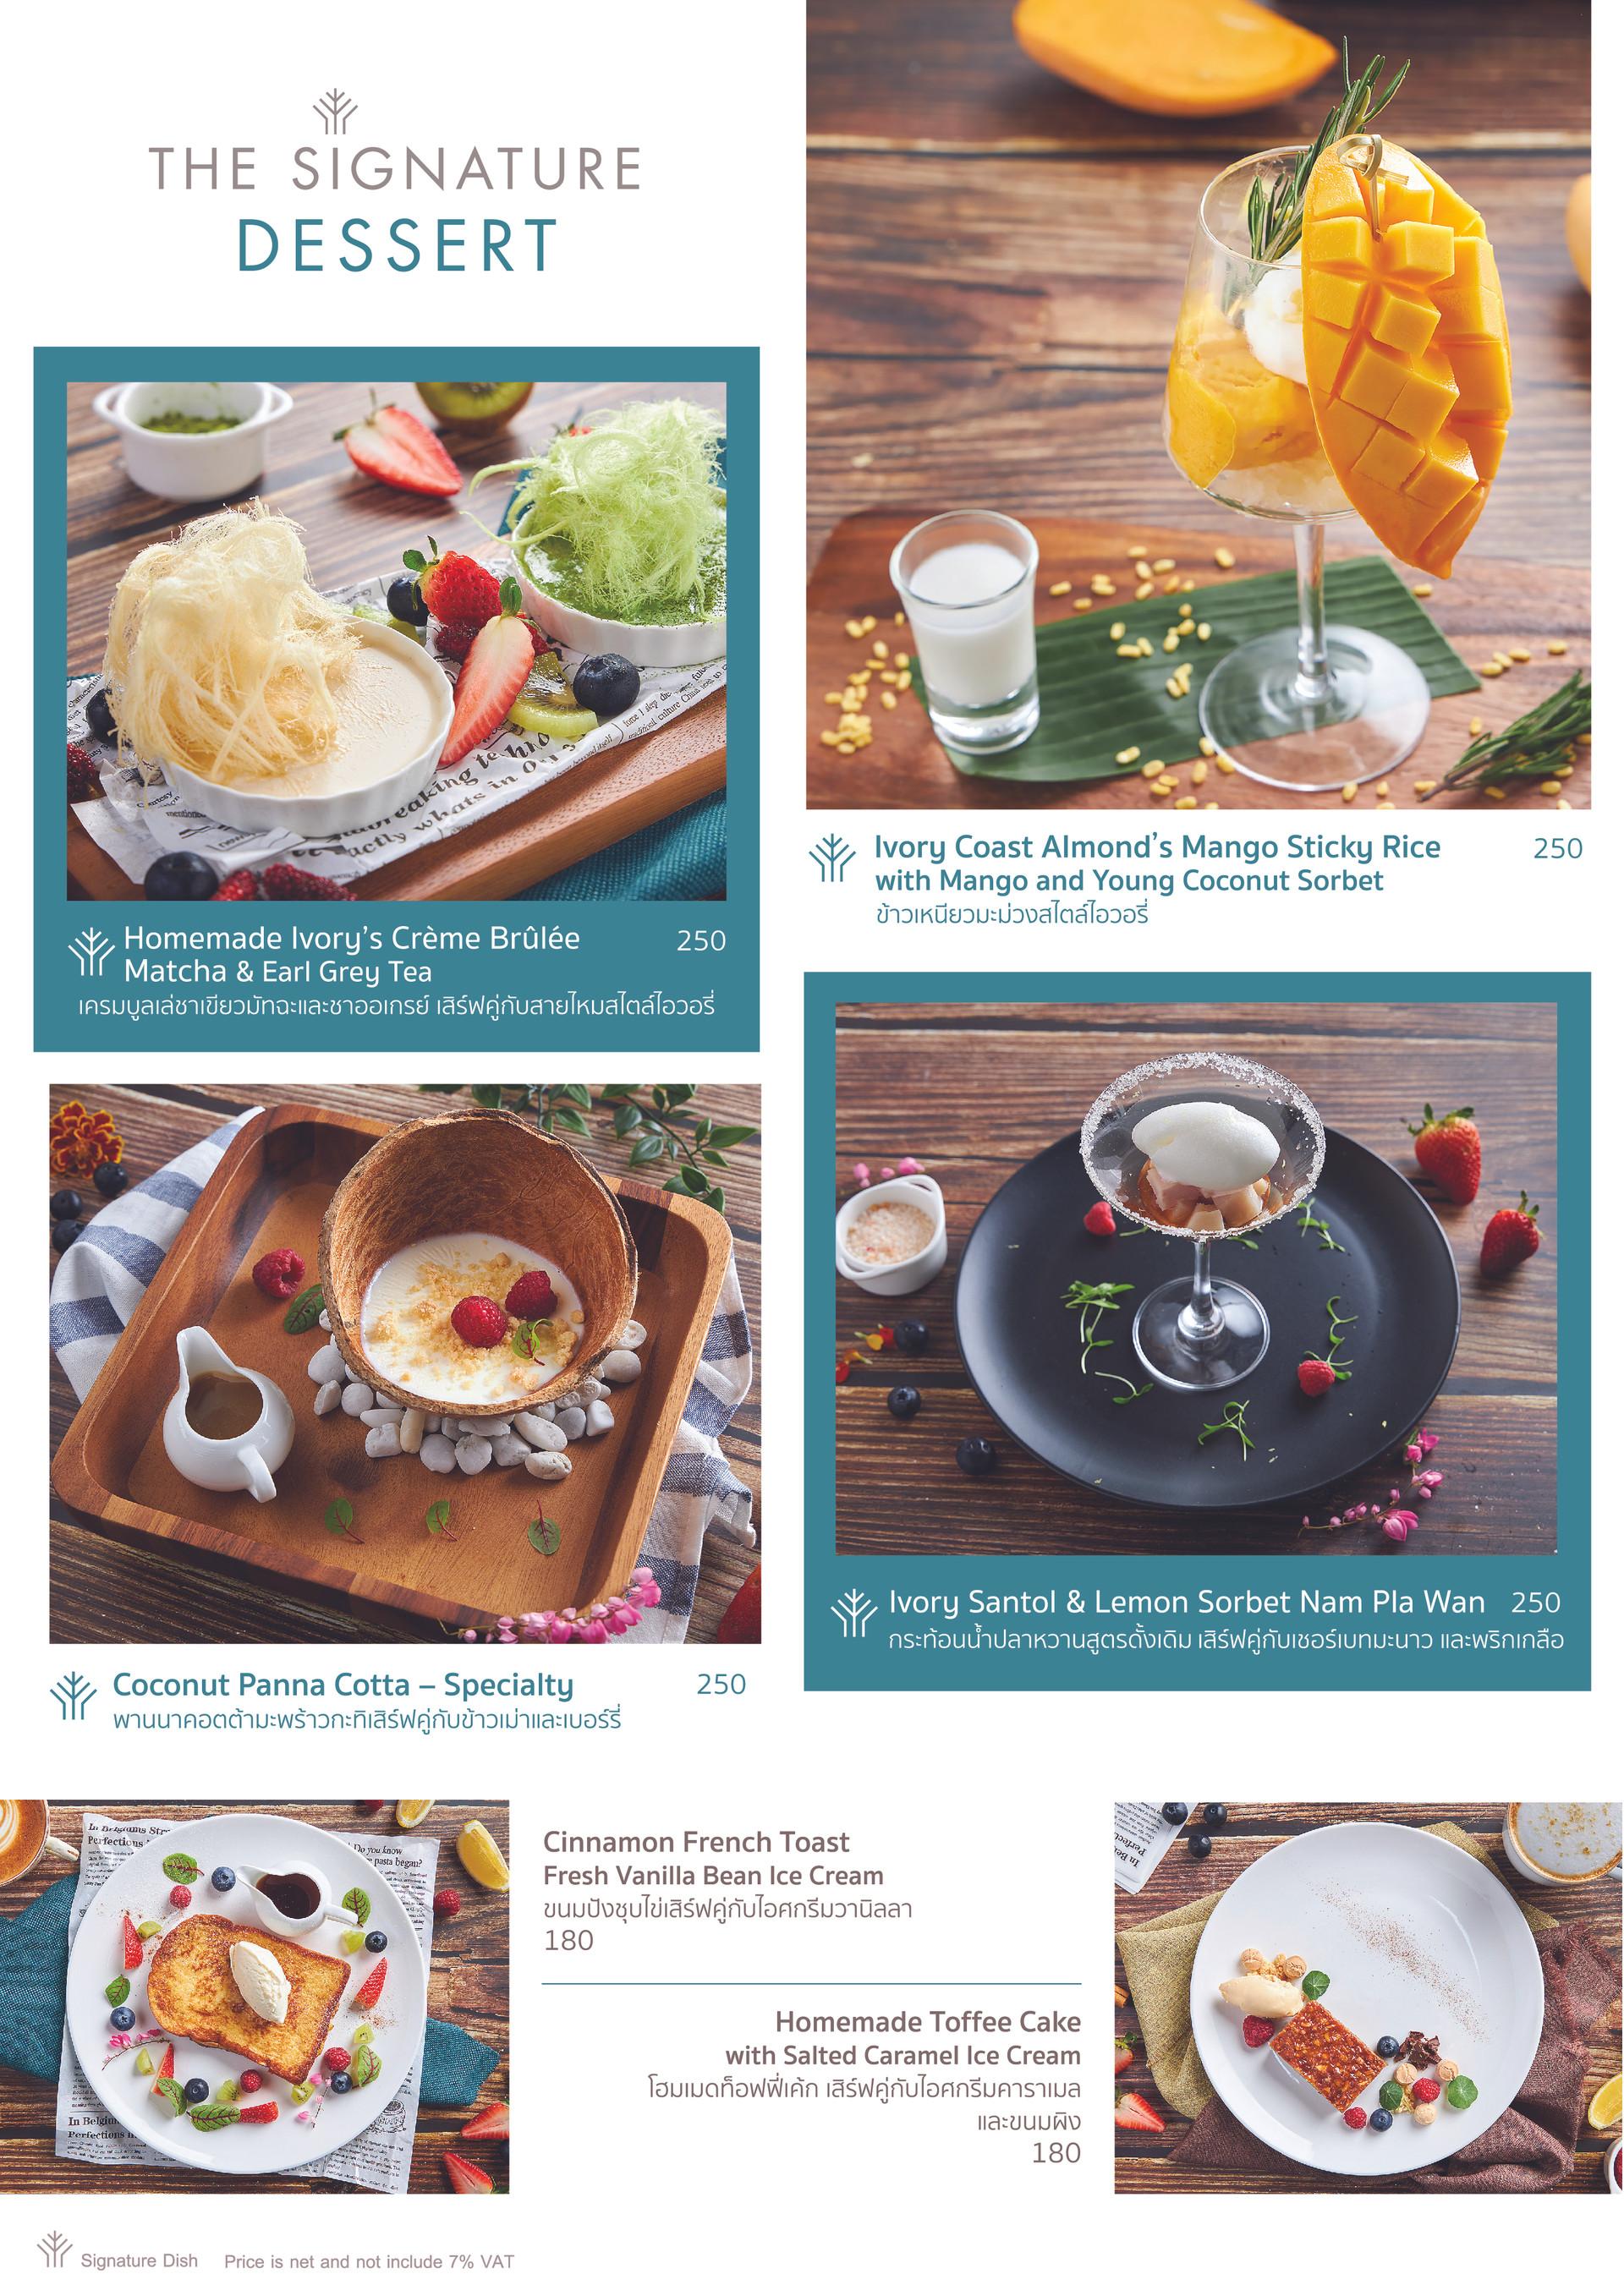 ivc new menu-10.jpg